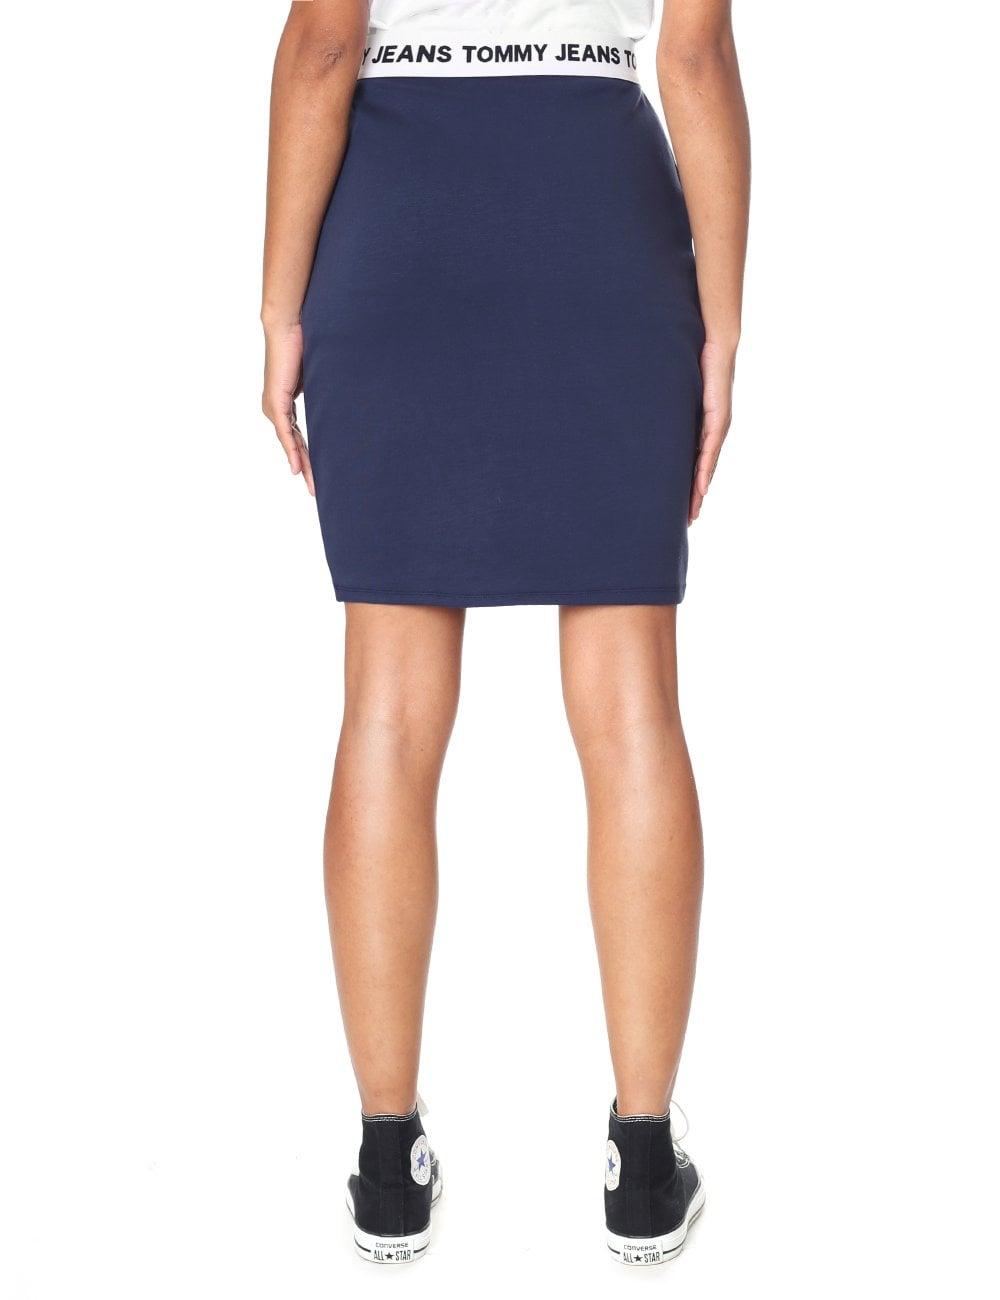 08c738537b Tommy Hilfiger Women's Logo Pencil Skirt